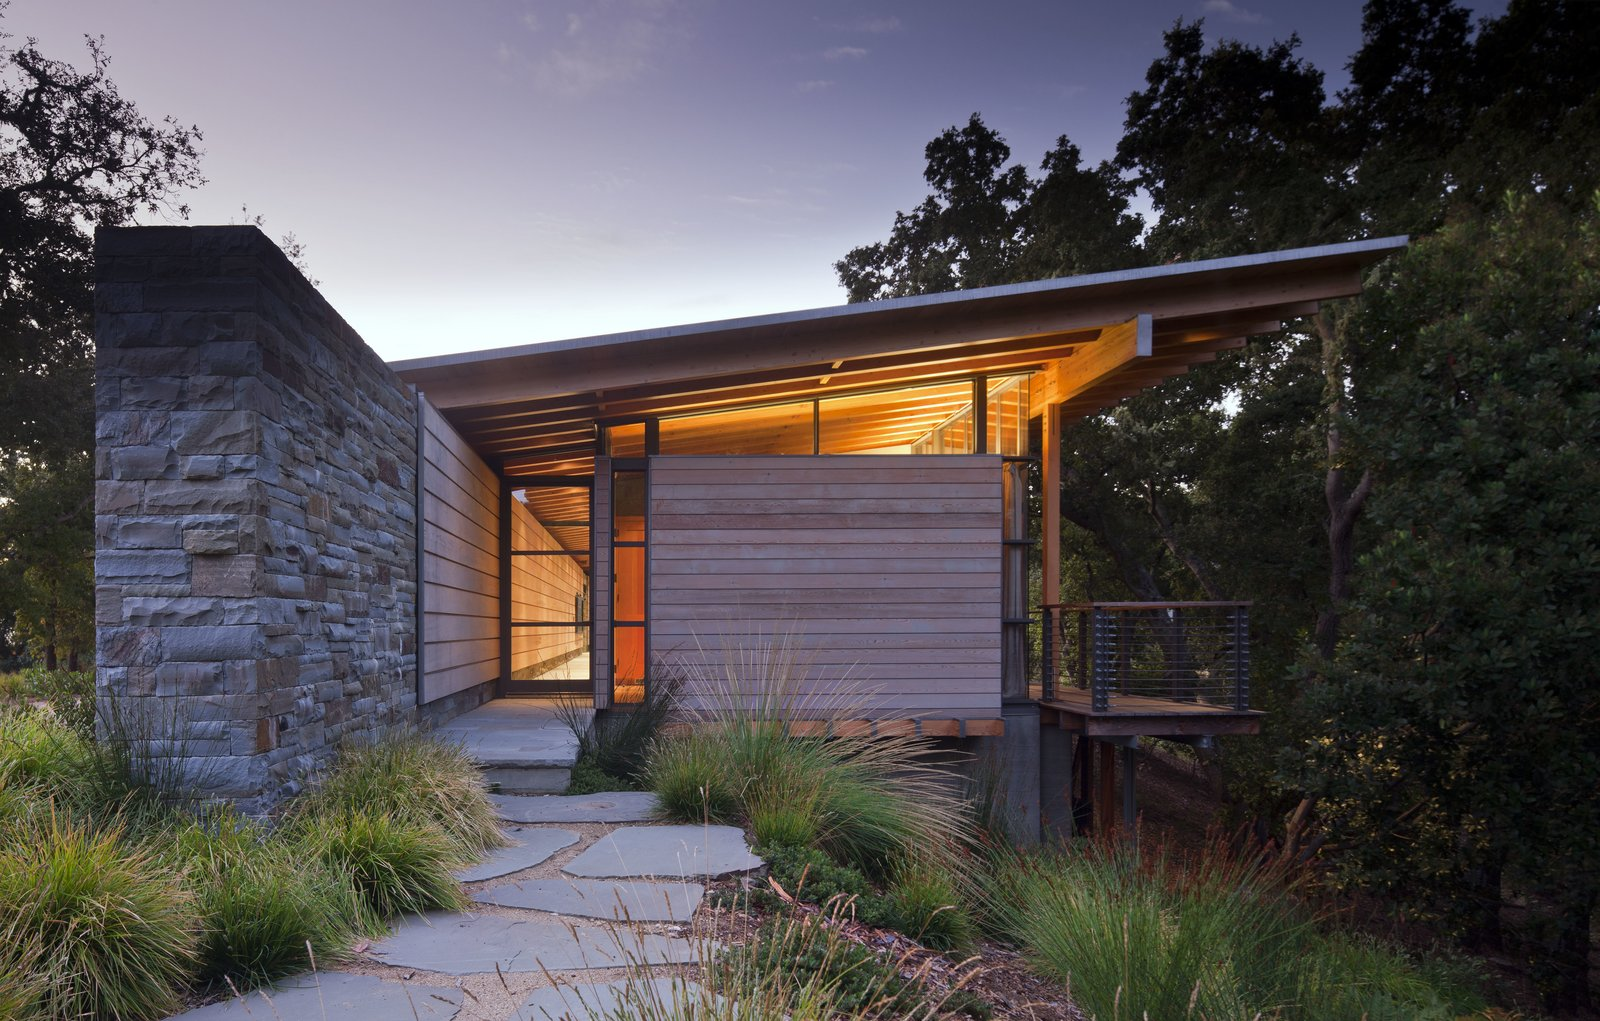 Exterior, House Building Type, Wood Siding Material, Stone Siding Material, and Glass Siding Material  Halls Ridge Knoll by Bohlin Cywinski Jackson